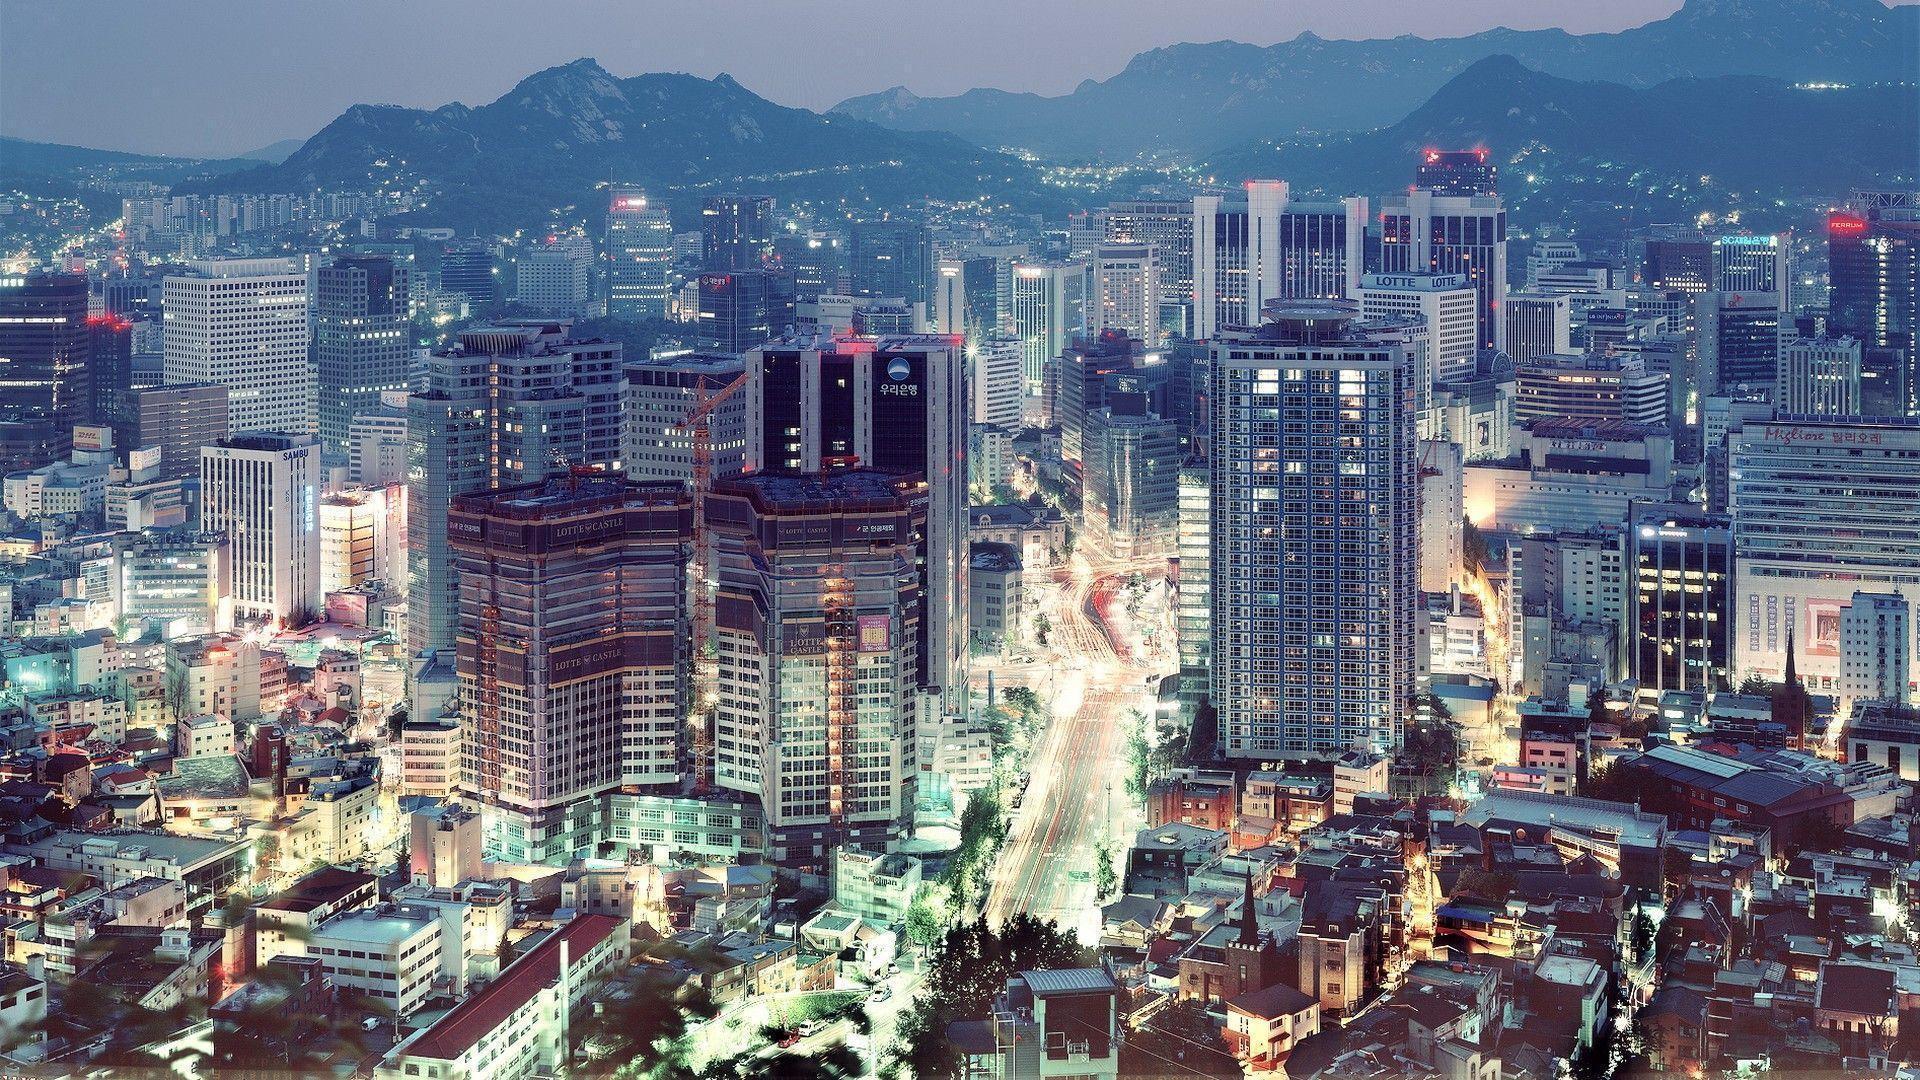 Shiodome Skyline At Night Minato Tokyo Japan 4k Ultrahd – Fondos de